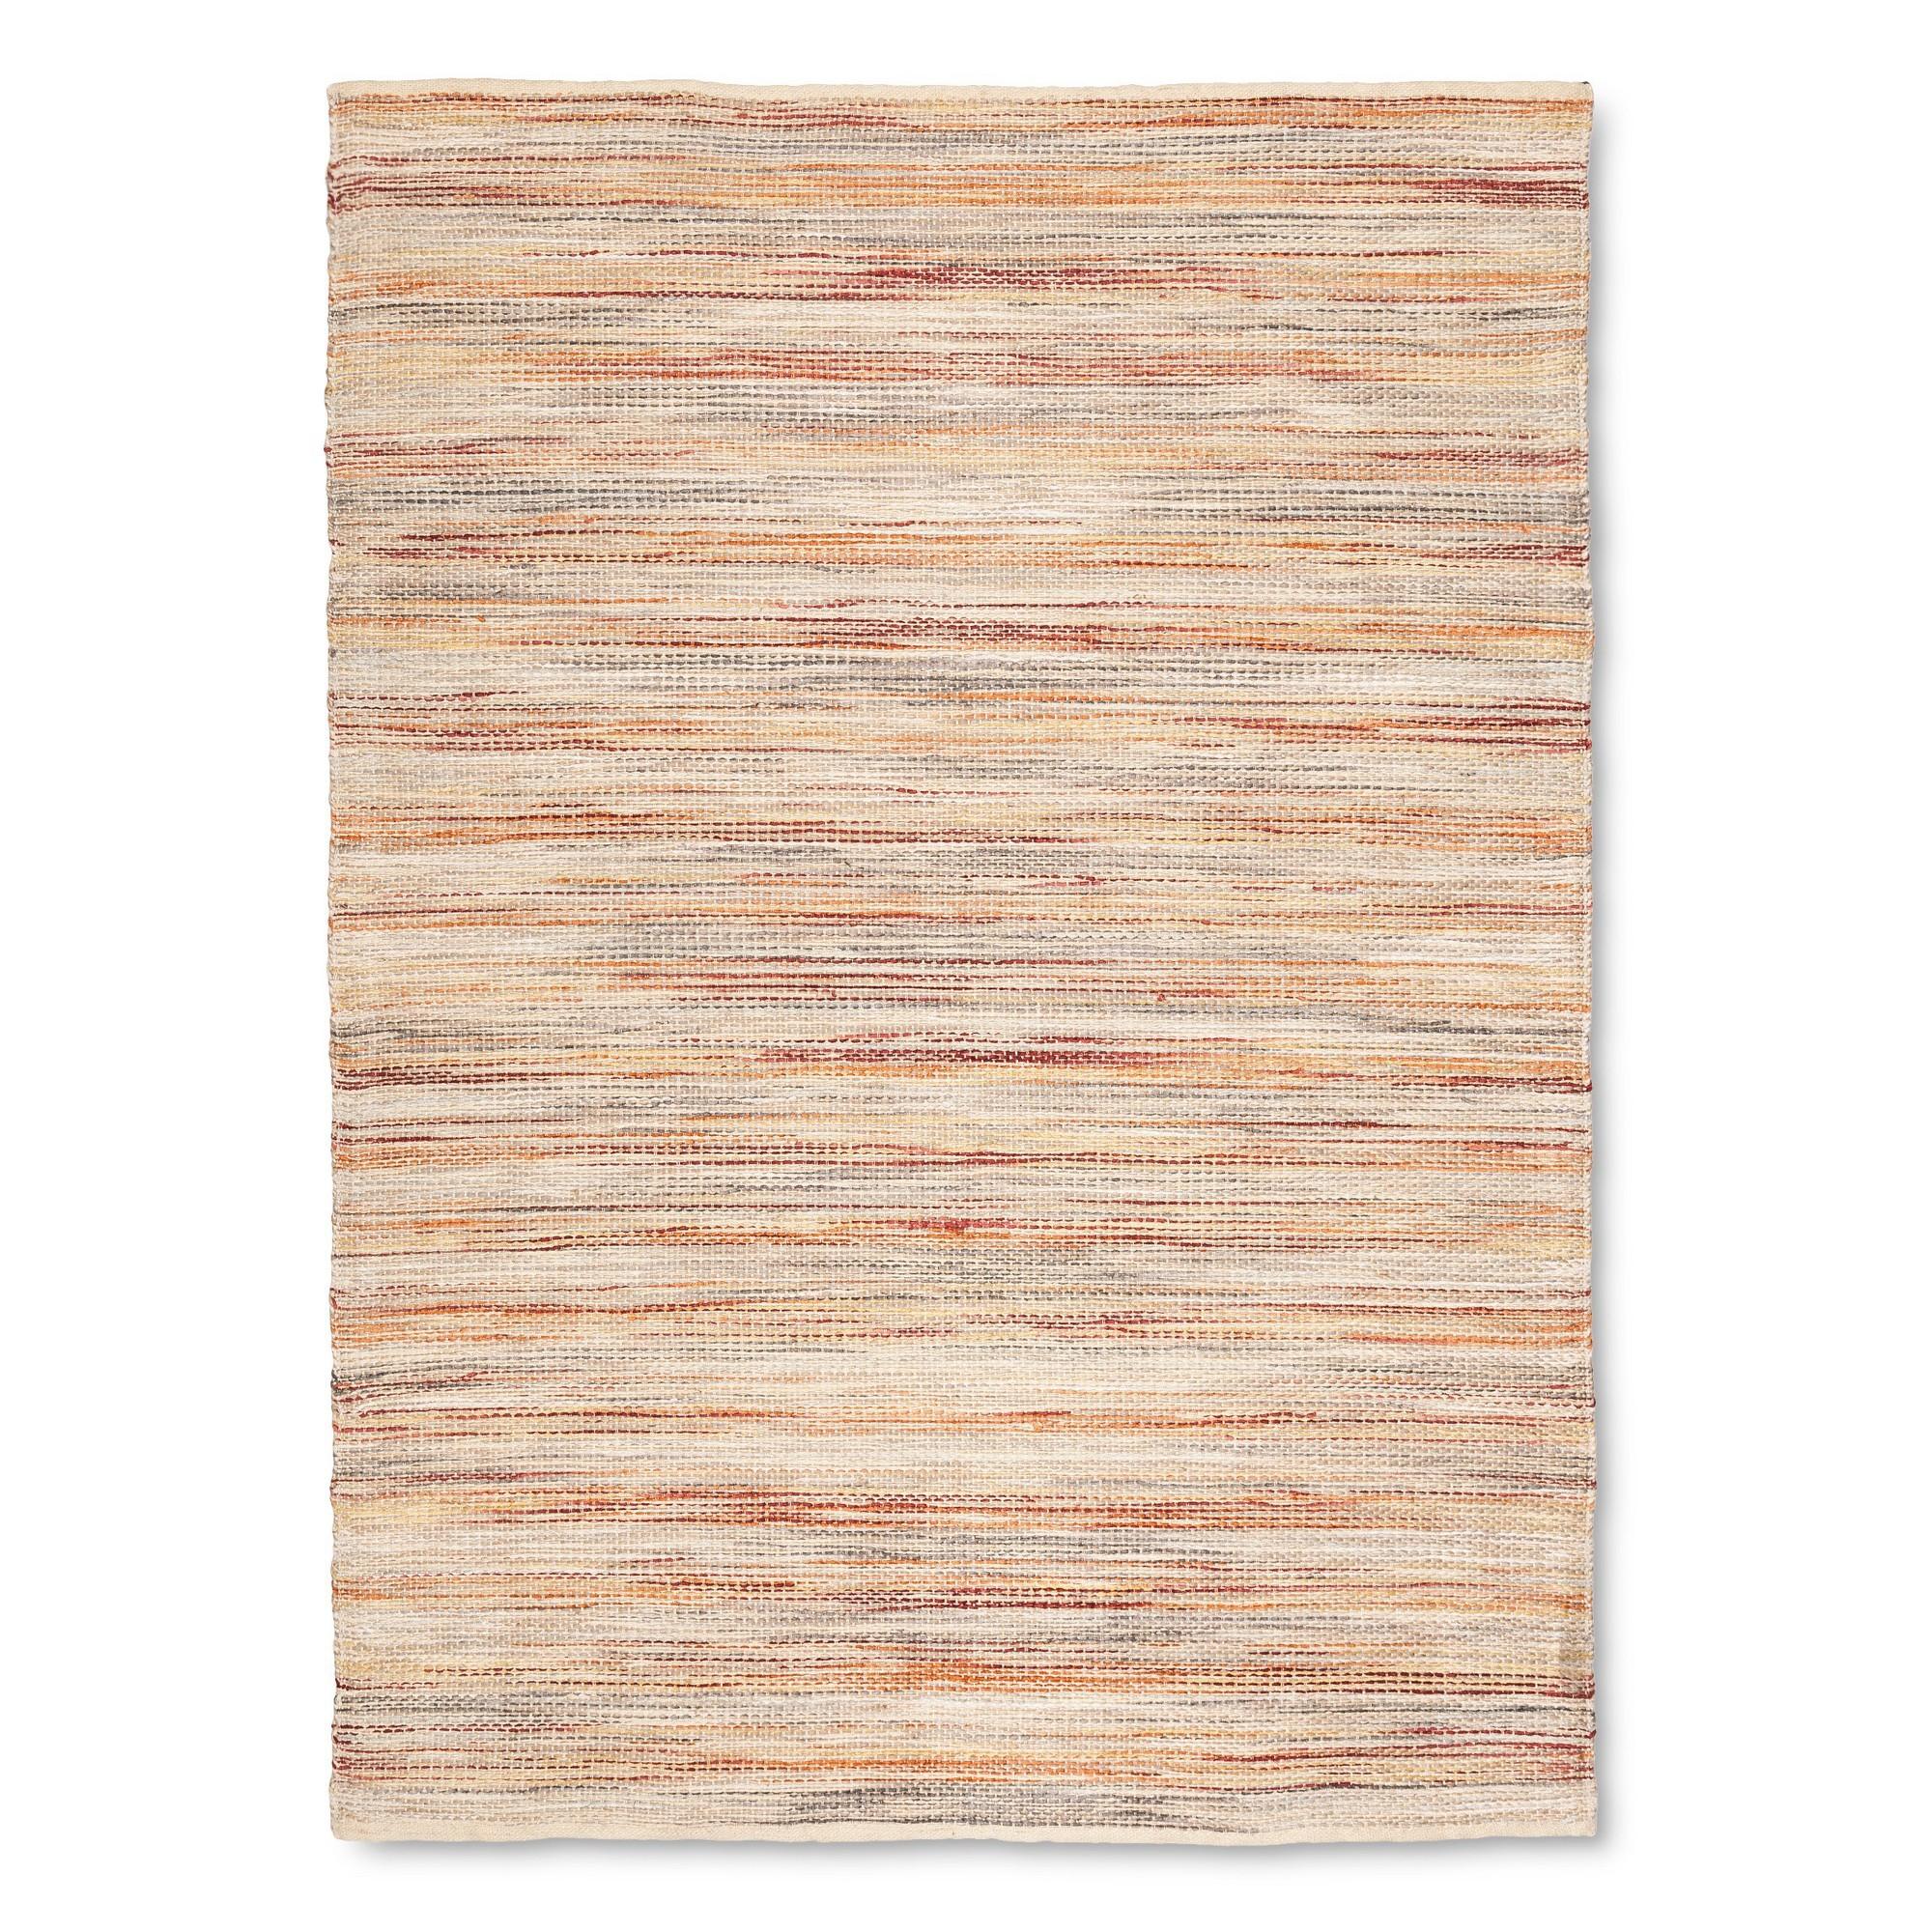 9'x12' Woven Area Rug Warm Natural - Threshold